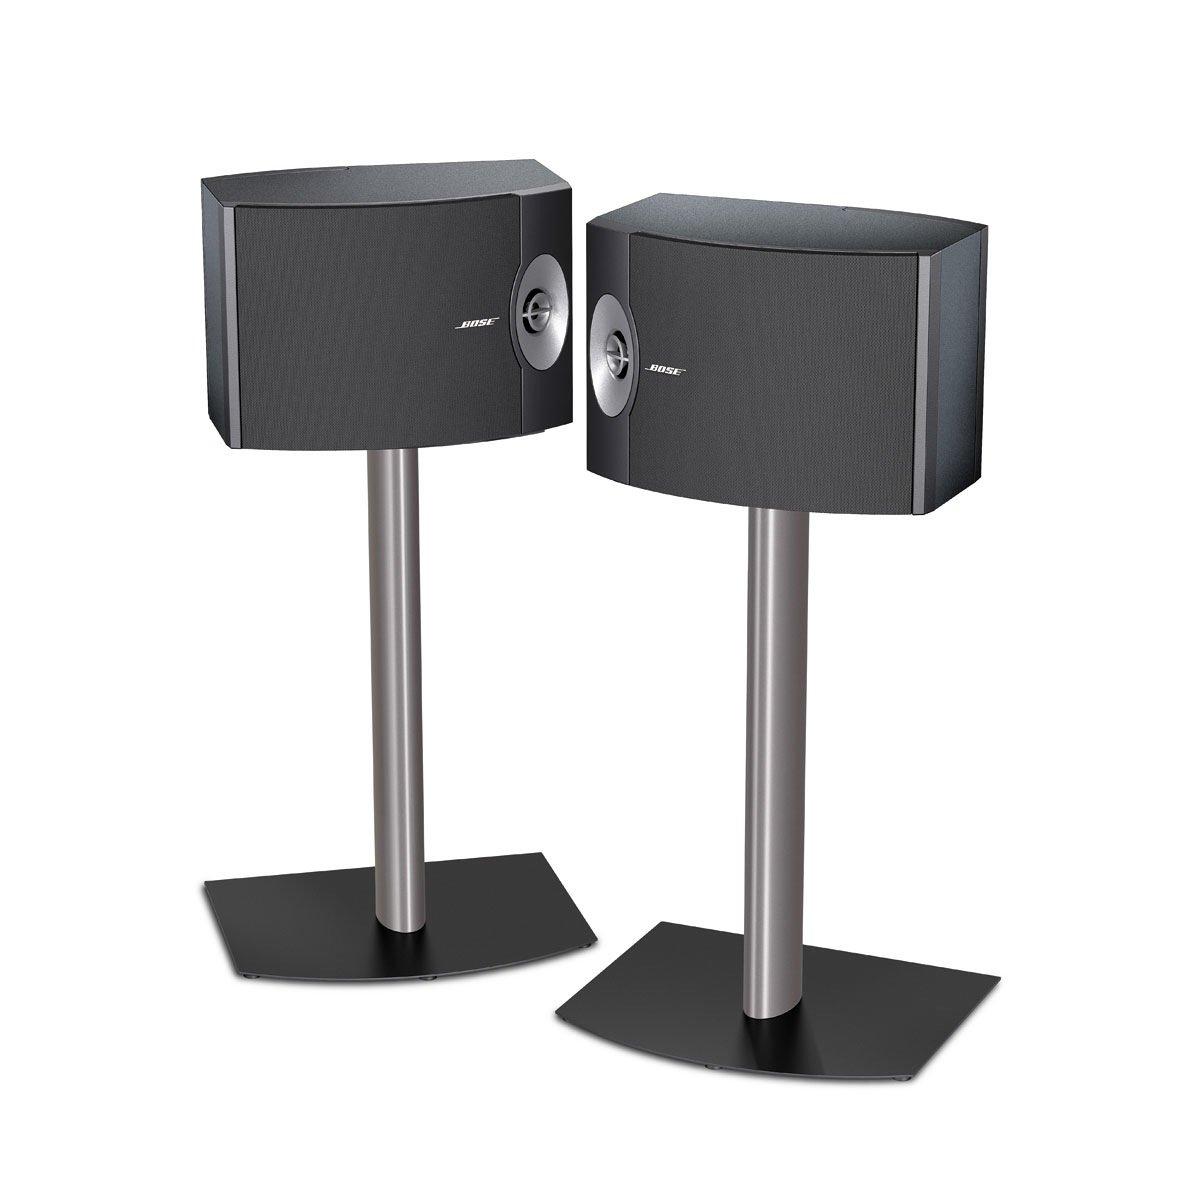 Bose 301-V Stereo Loudspeakers (Pair, Black) by Bose (Image #4)